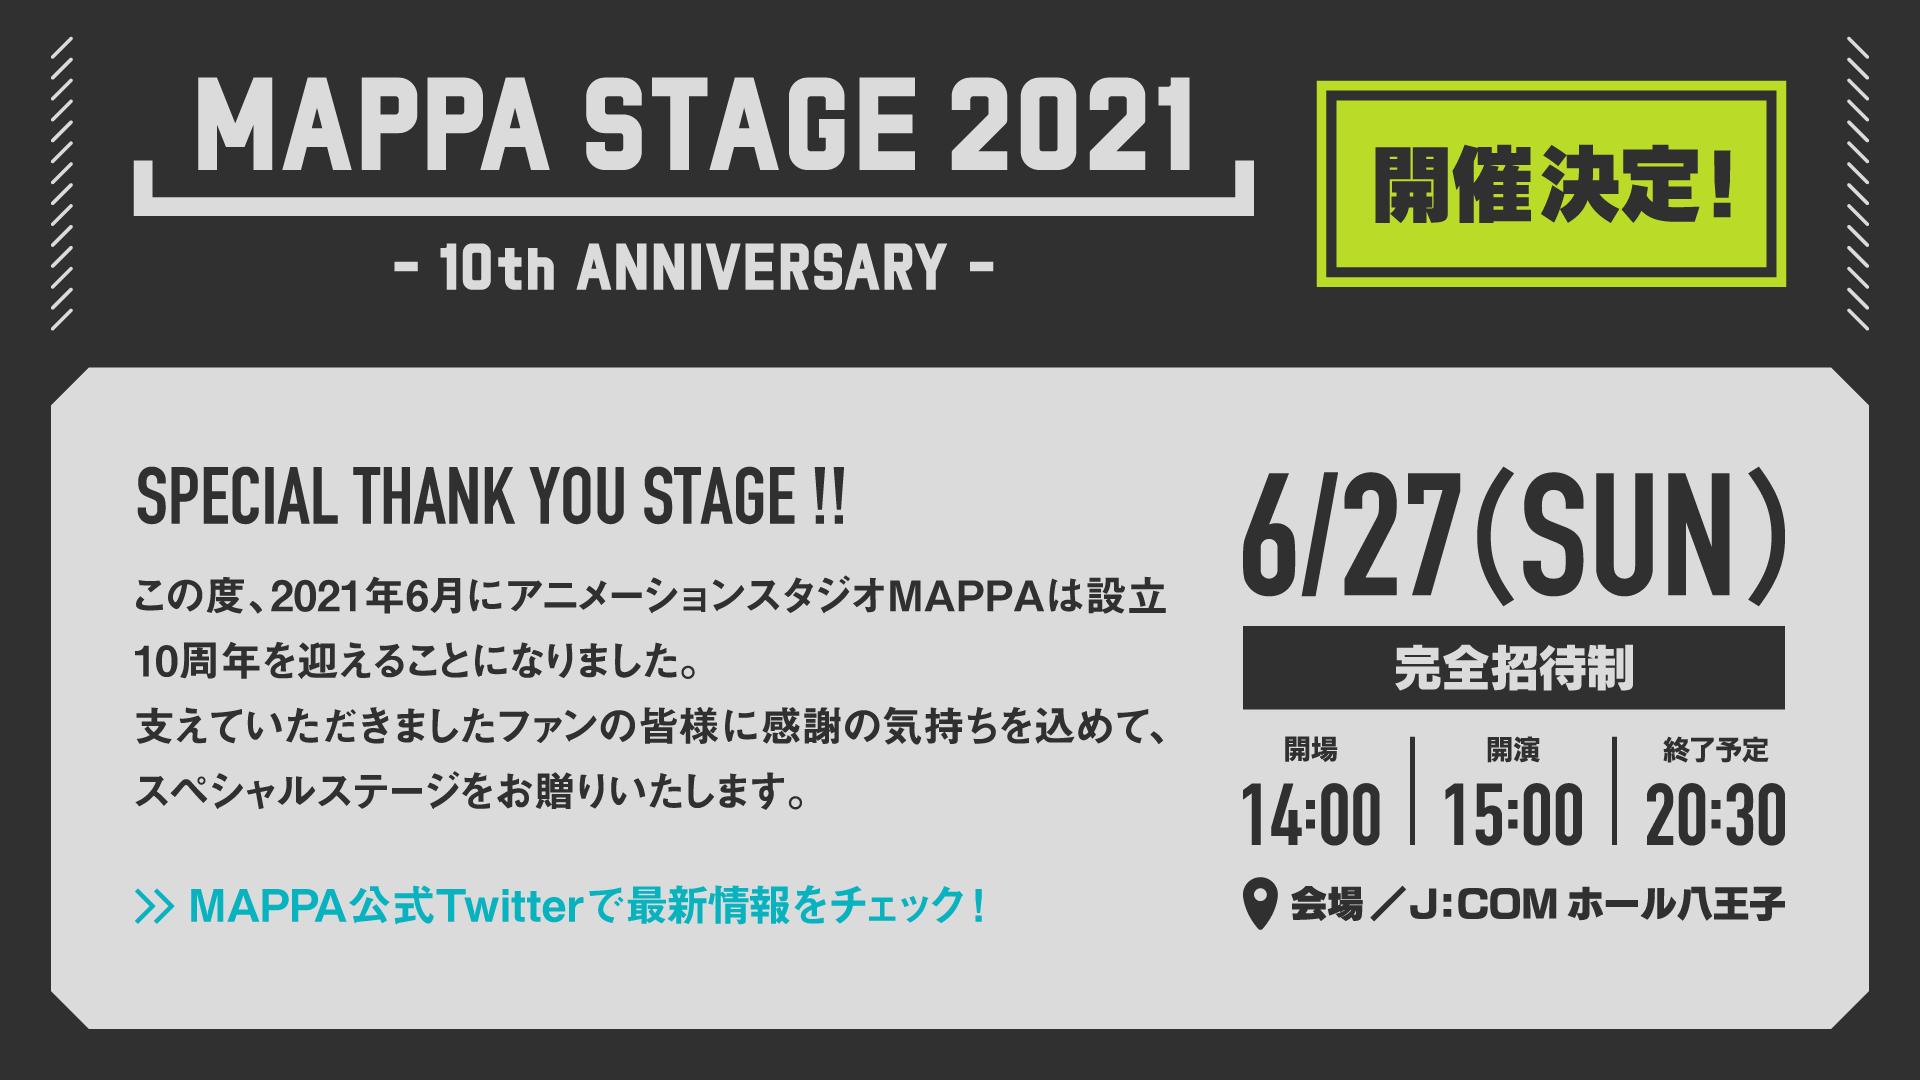 「MAPPA STAGE 2021 -10th Anniversary-」